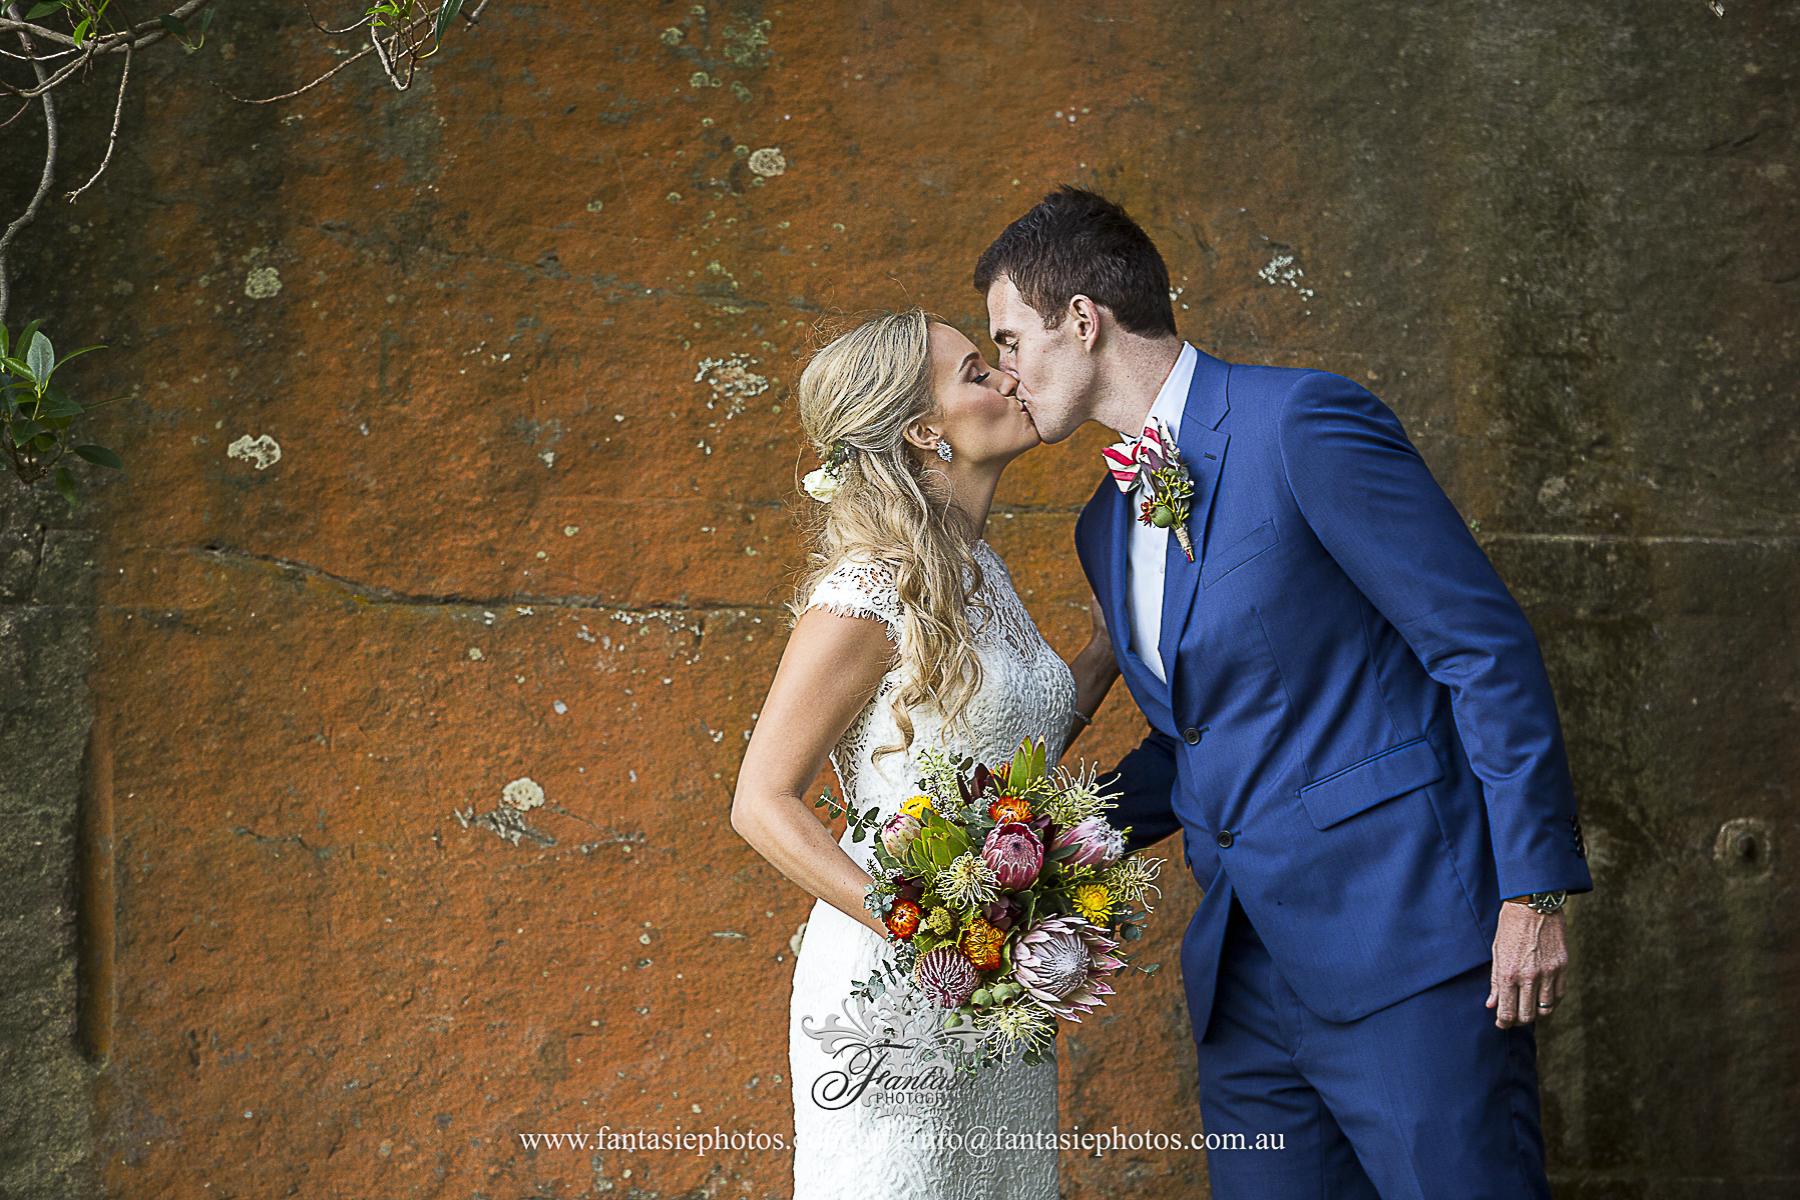 Sunset Wedding Location Shoot at Mosman | Fantasie Photography